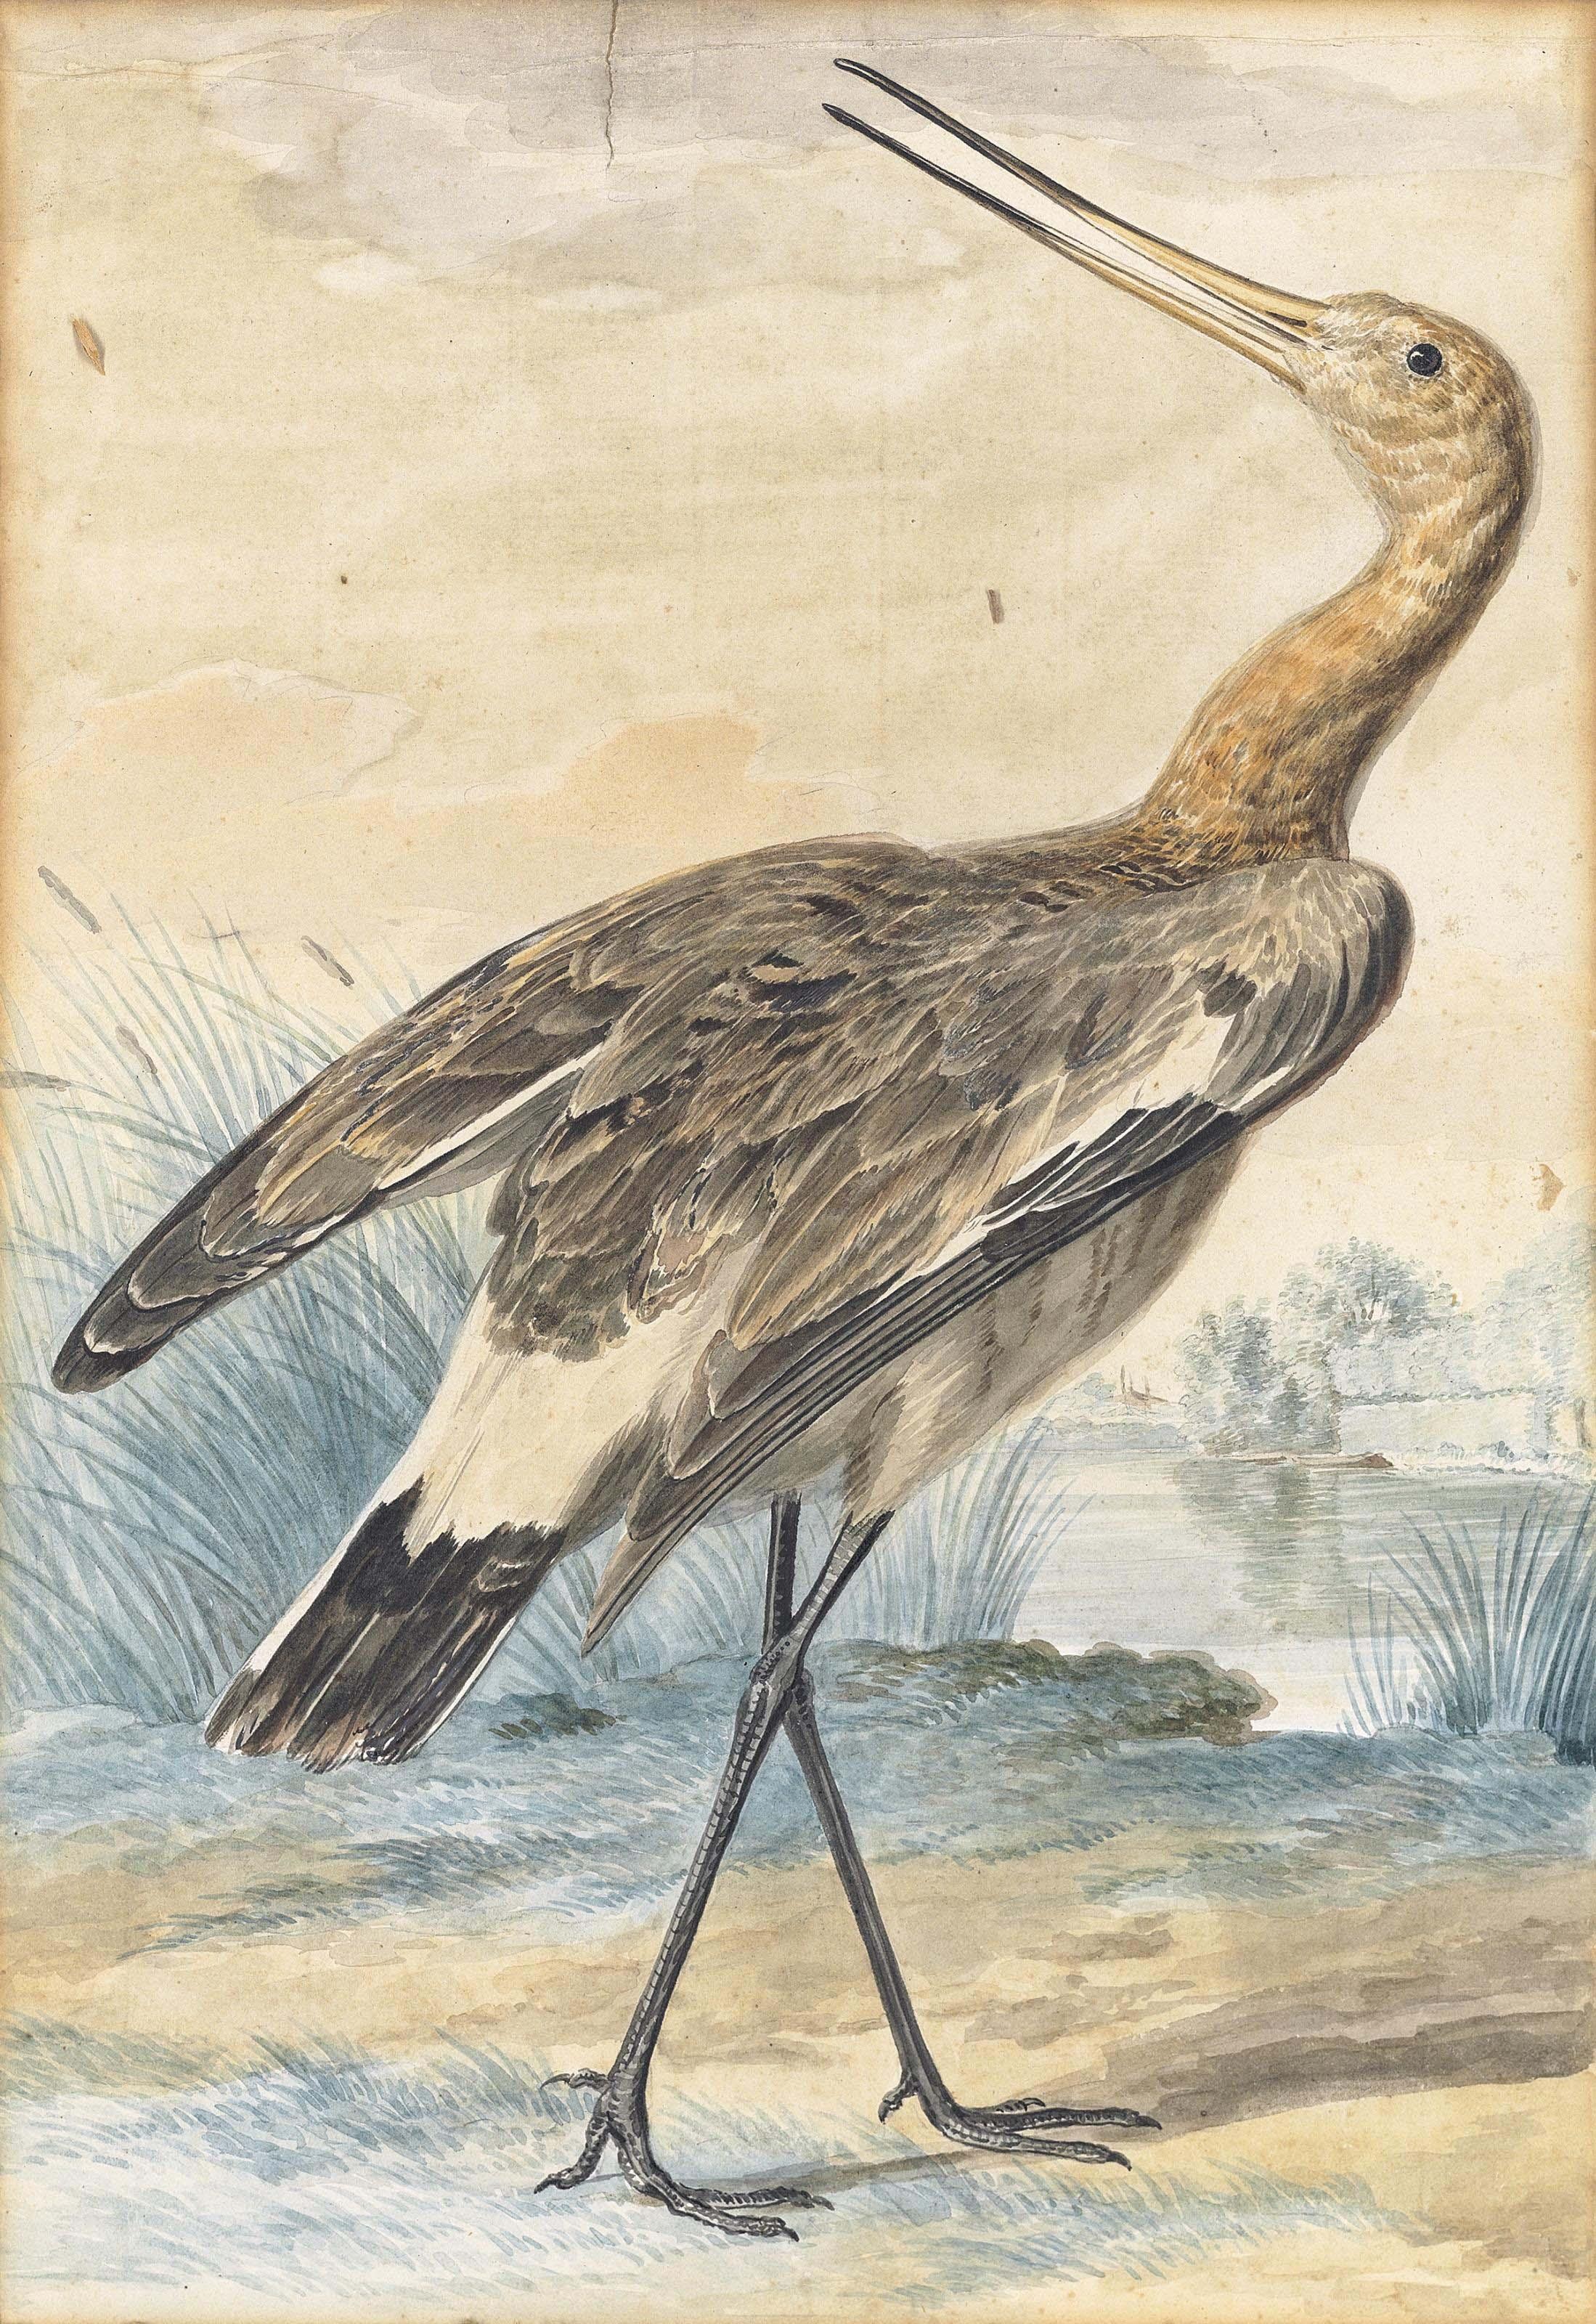 A black-tailed godwit (Limosa melanura)